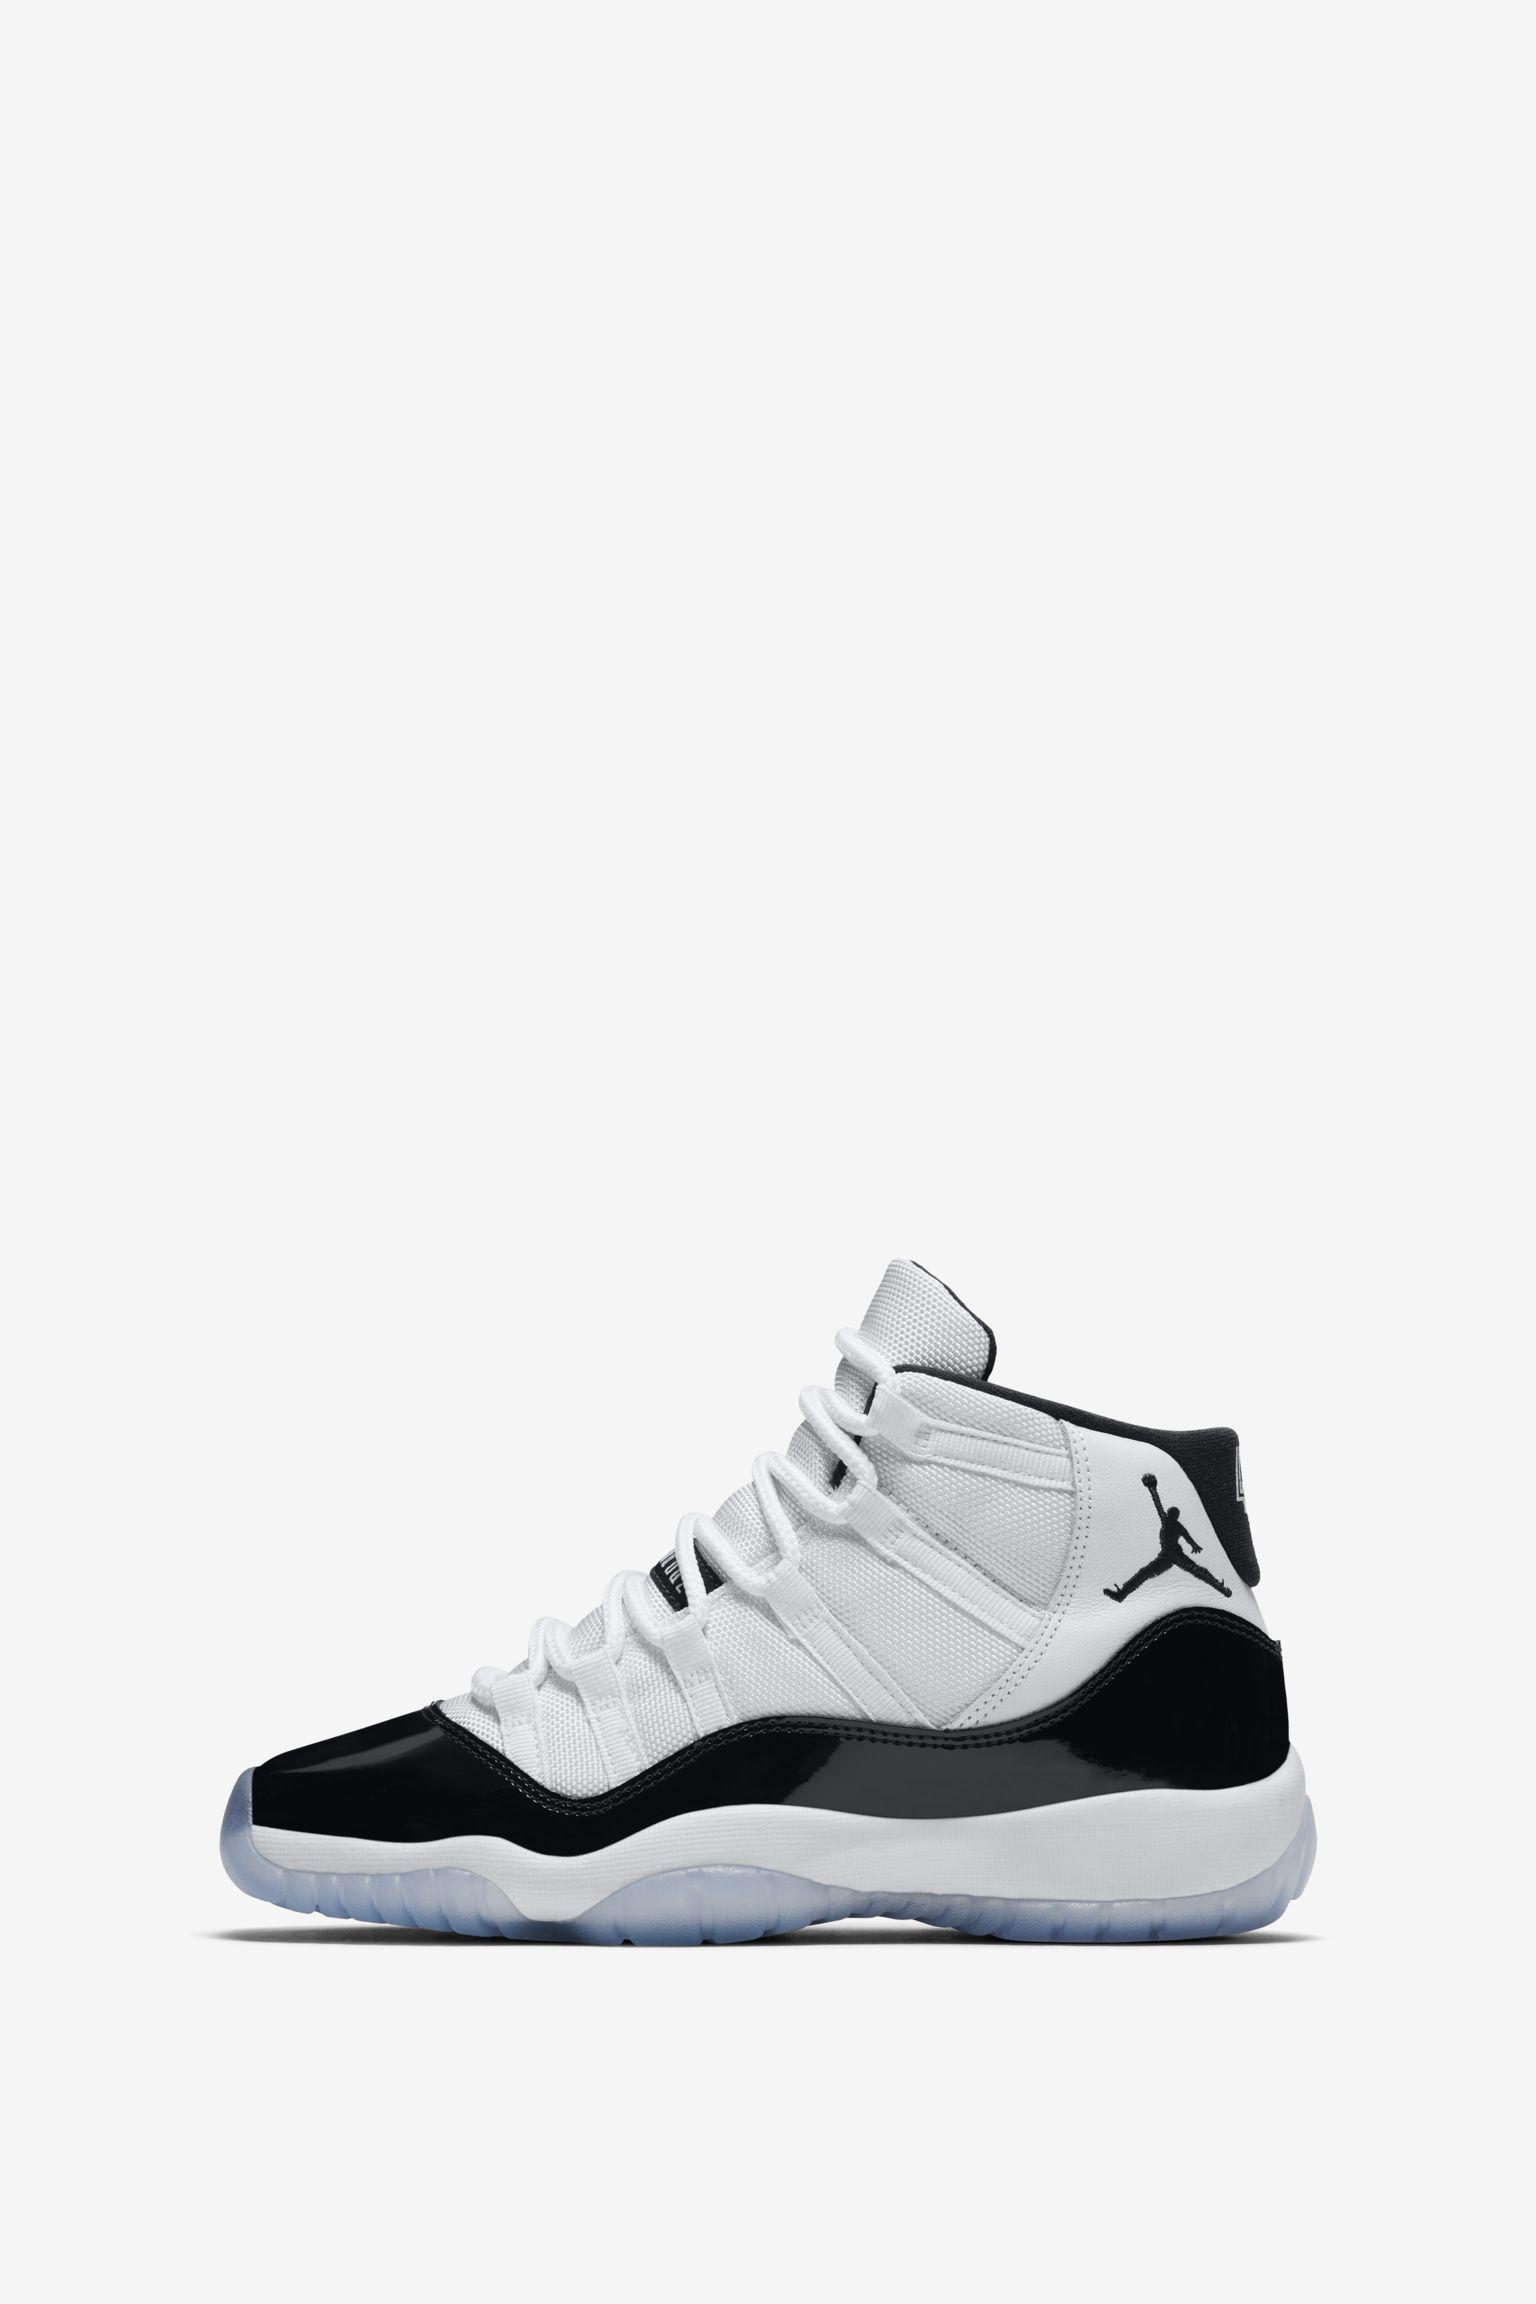 Air Jordan 11 'Concord' Release Date. Nike SNKRS